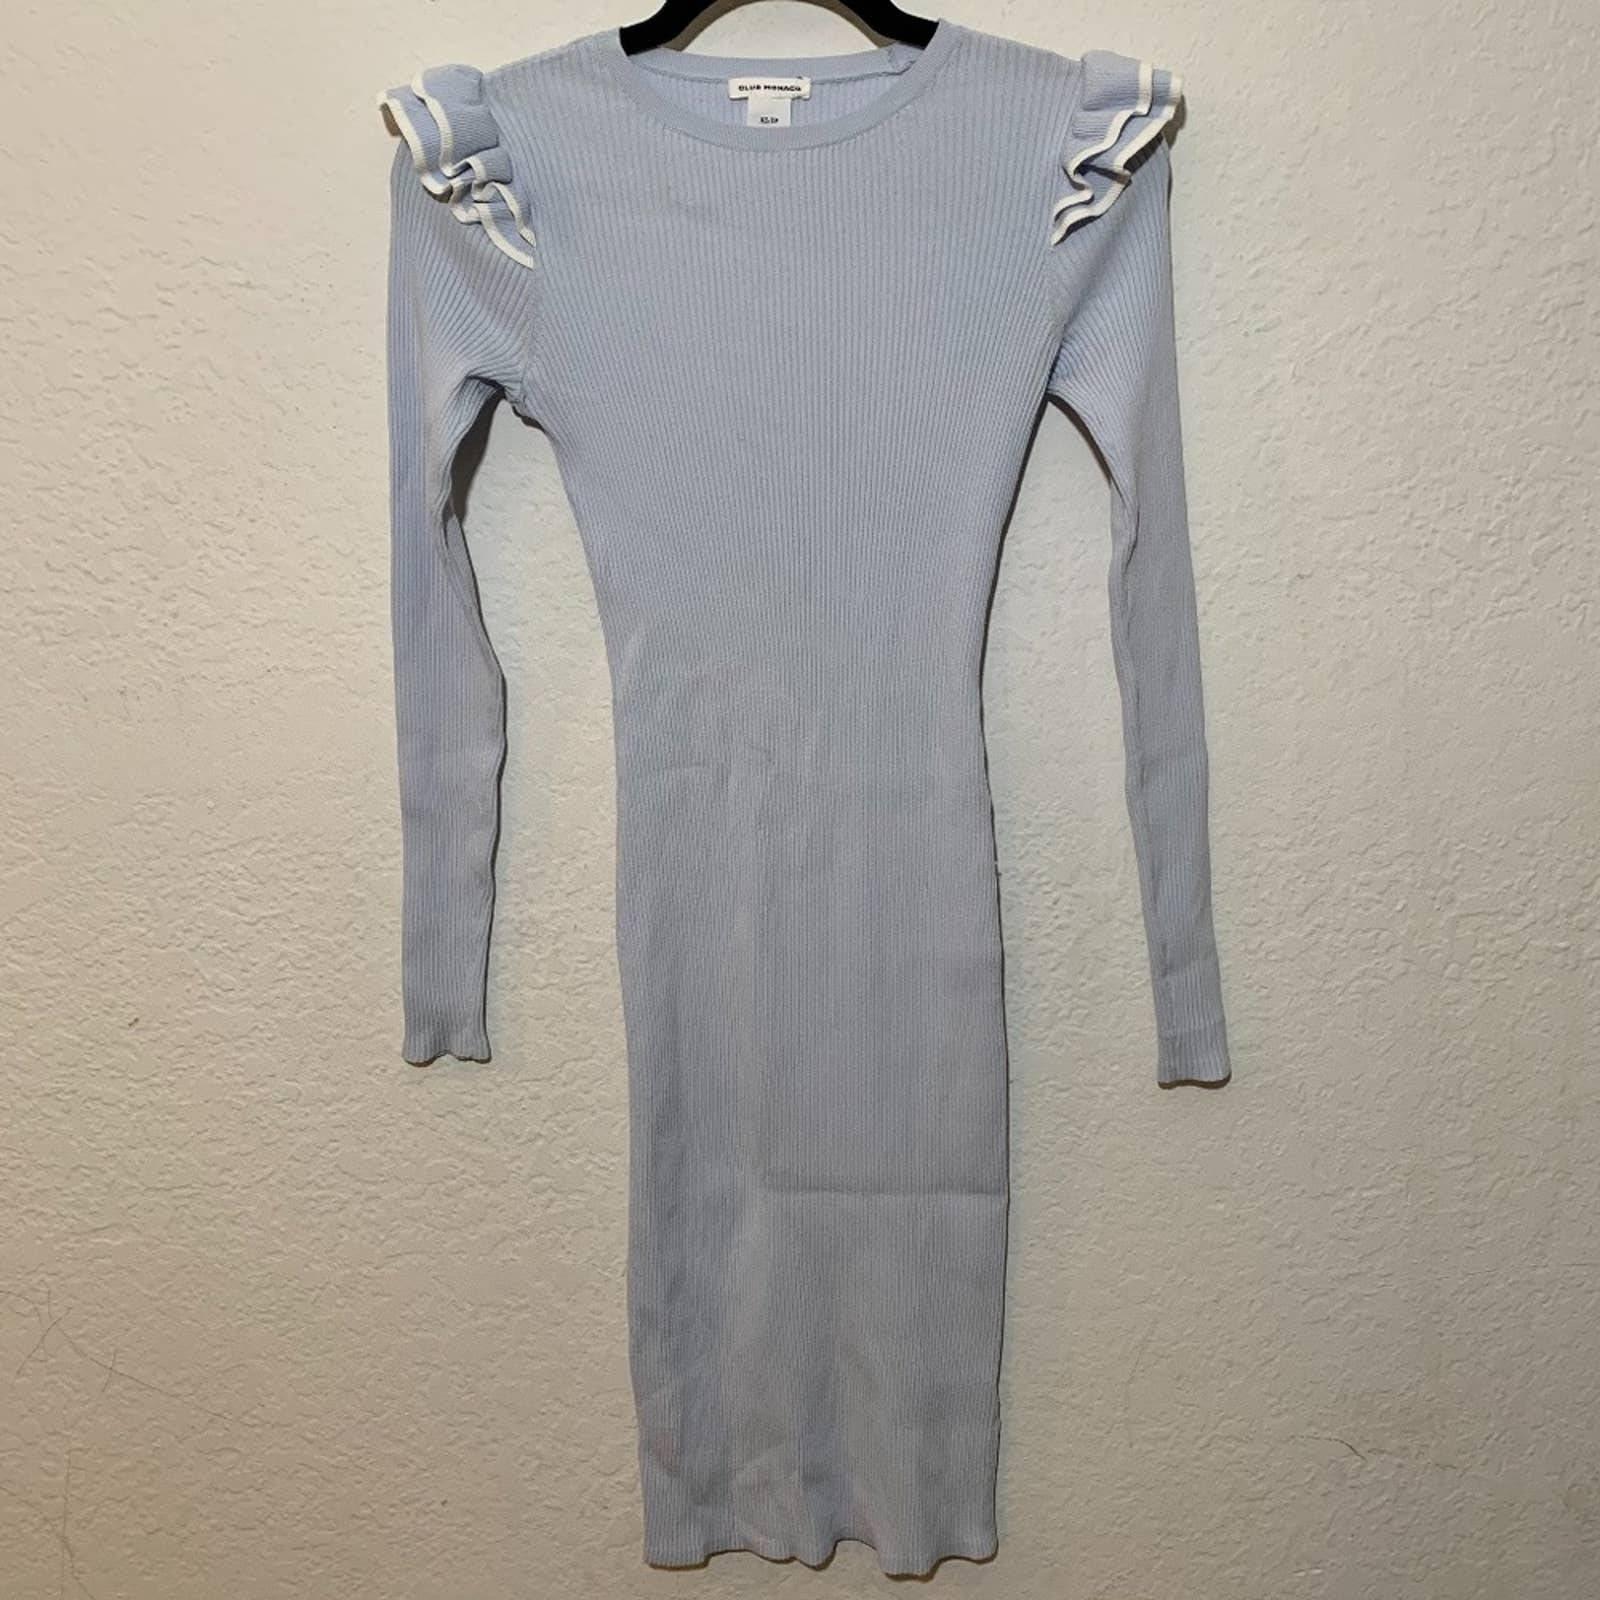 Club Monaco Long Sleeve Ribbed Dress